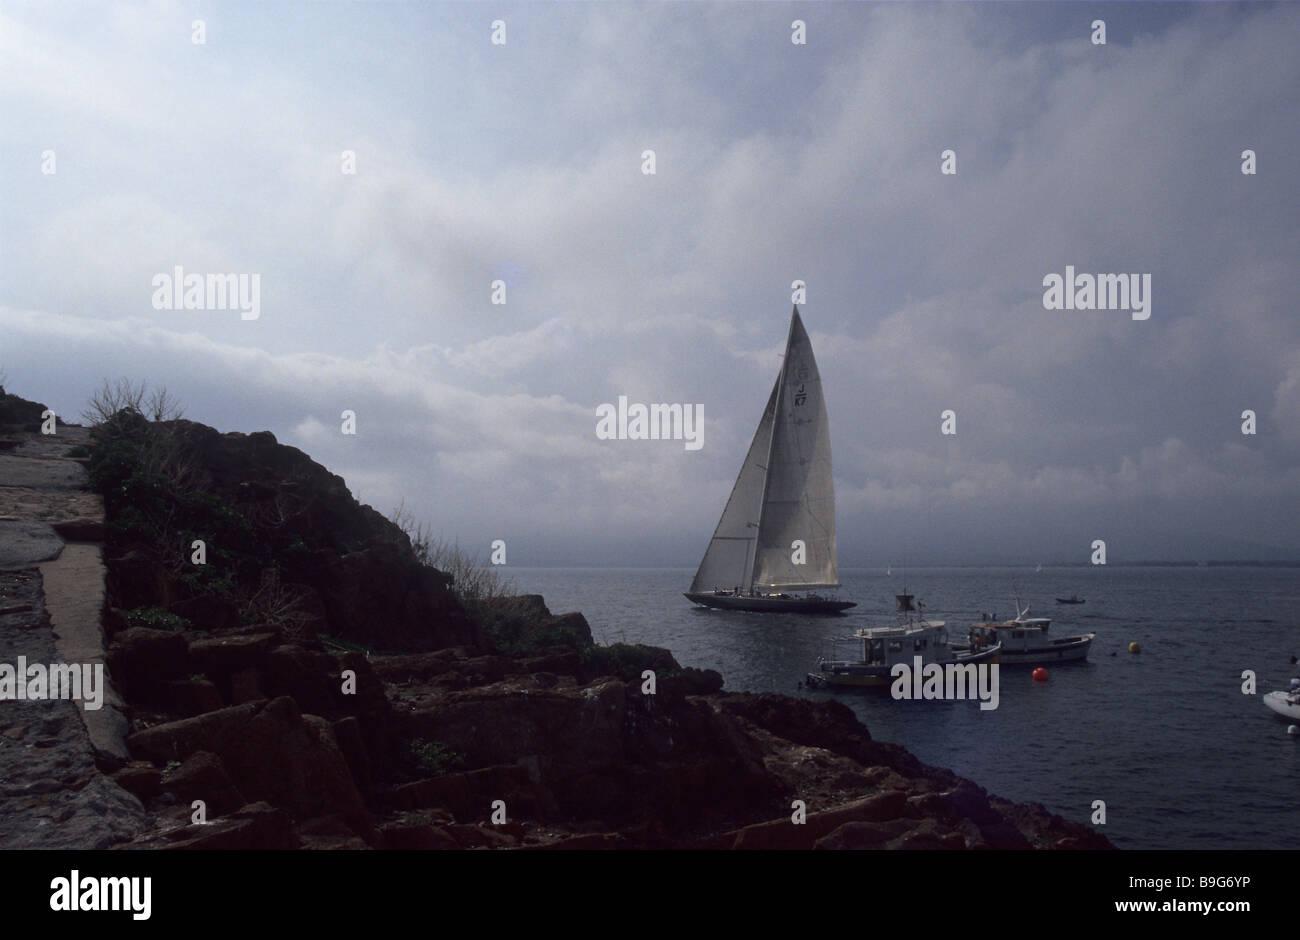 France Cote d'Azur St. Tropez coast lake sail-yacht fisher-boats - Stock Image